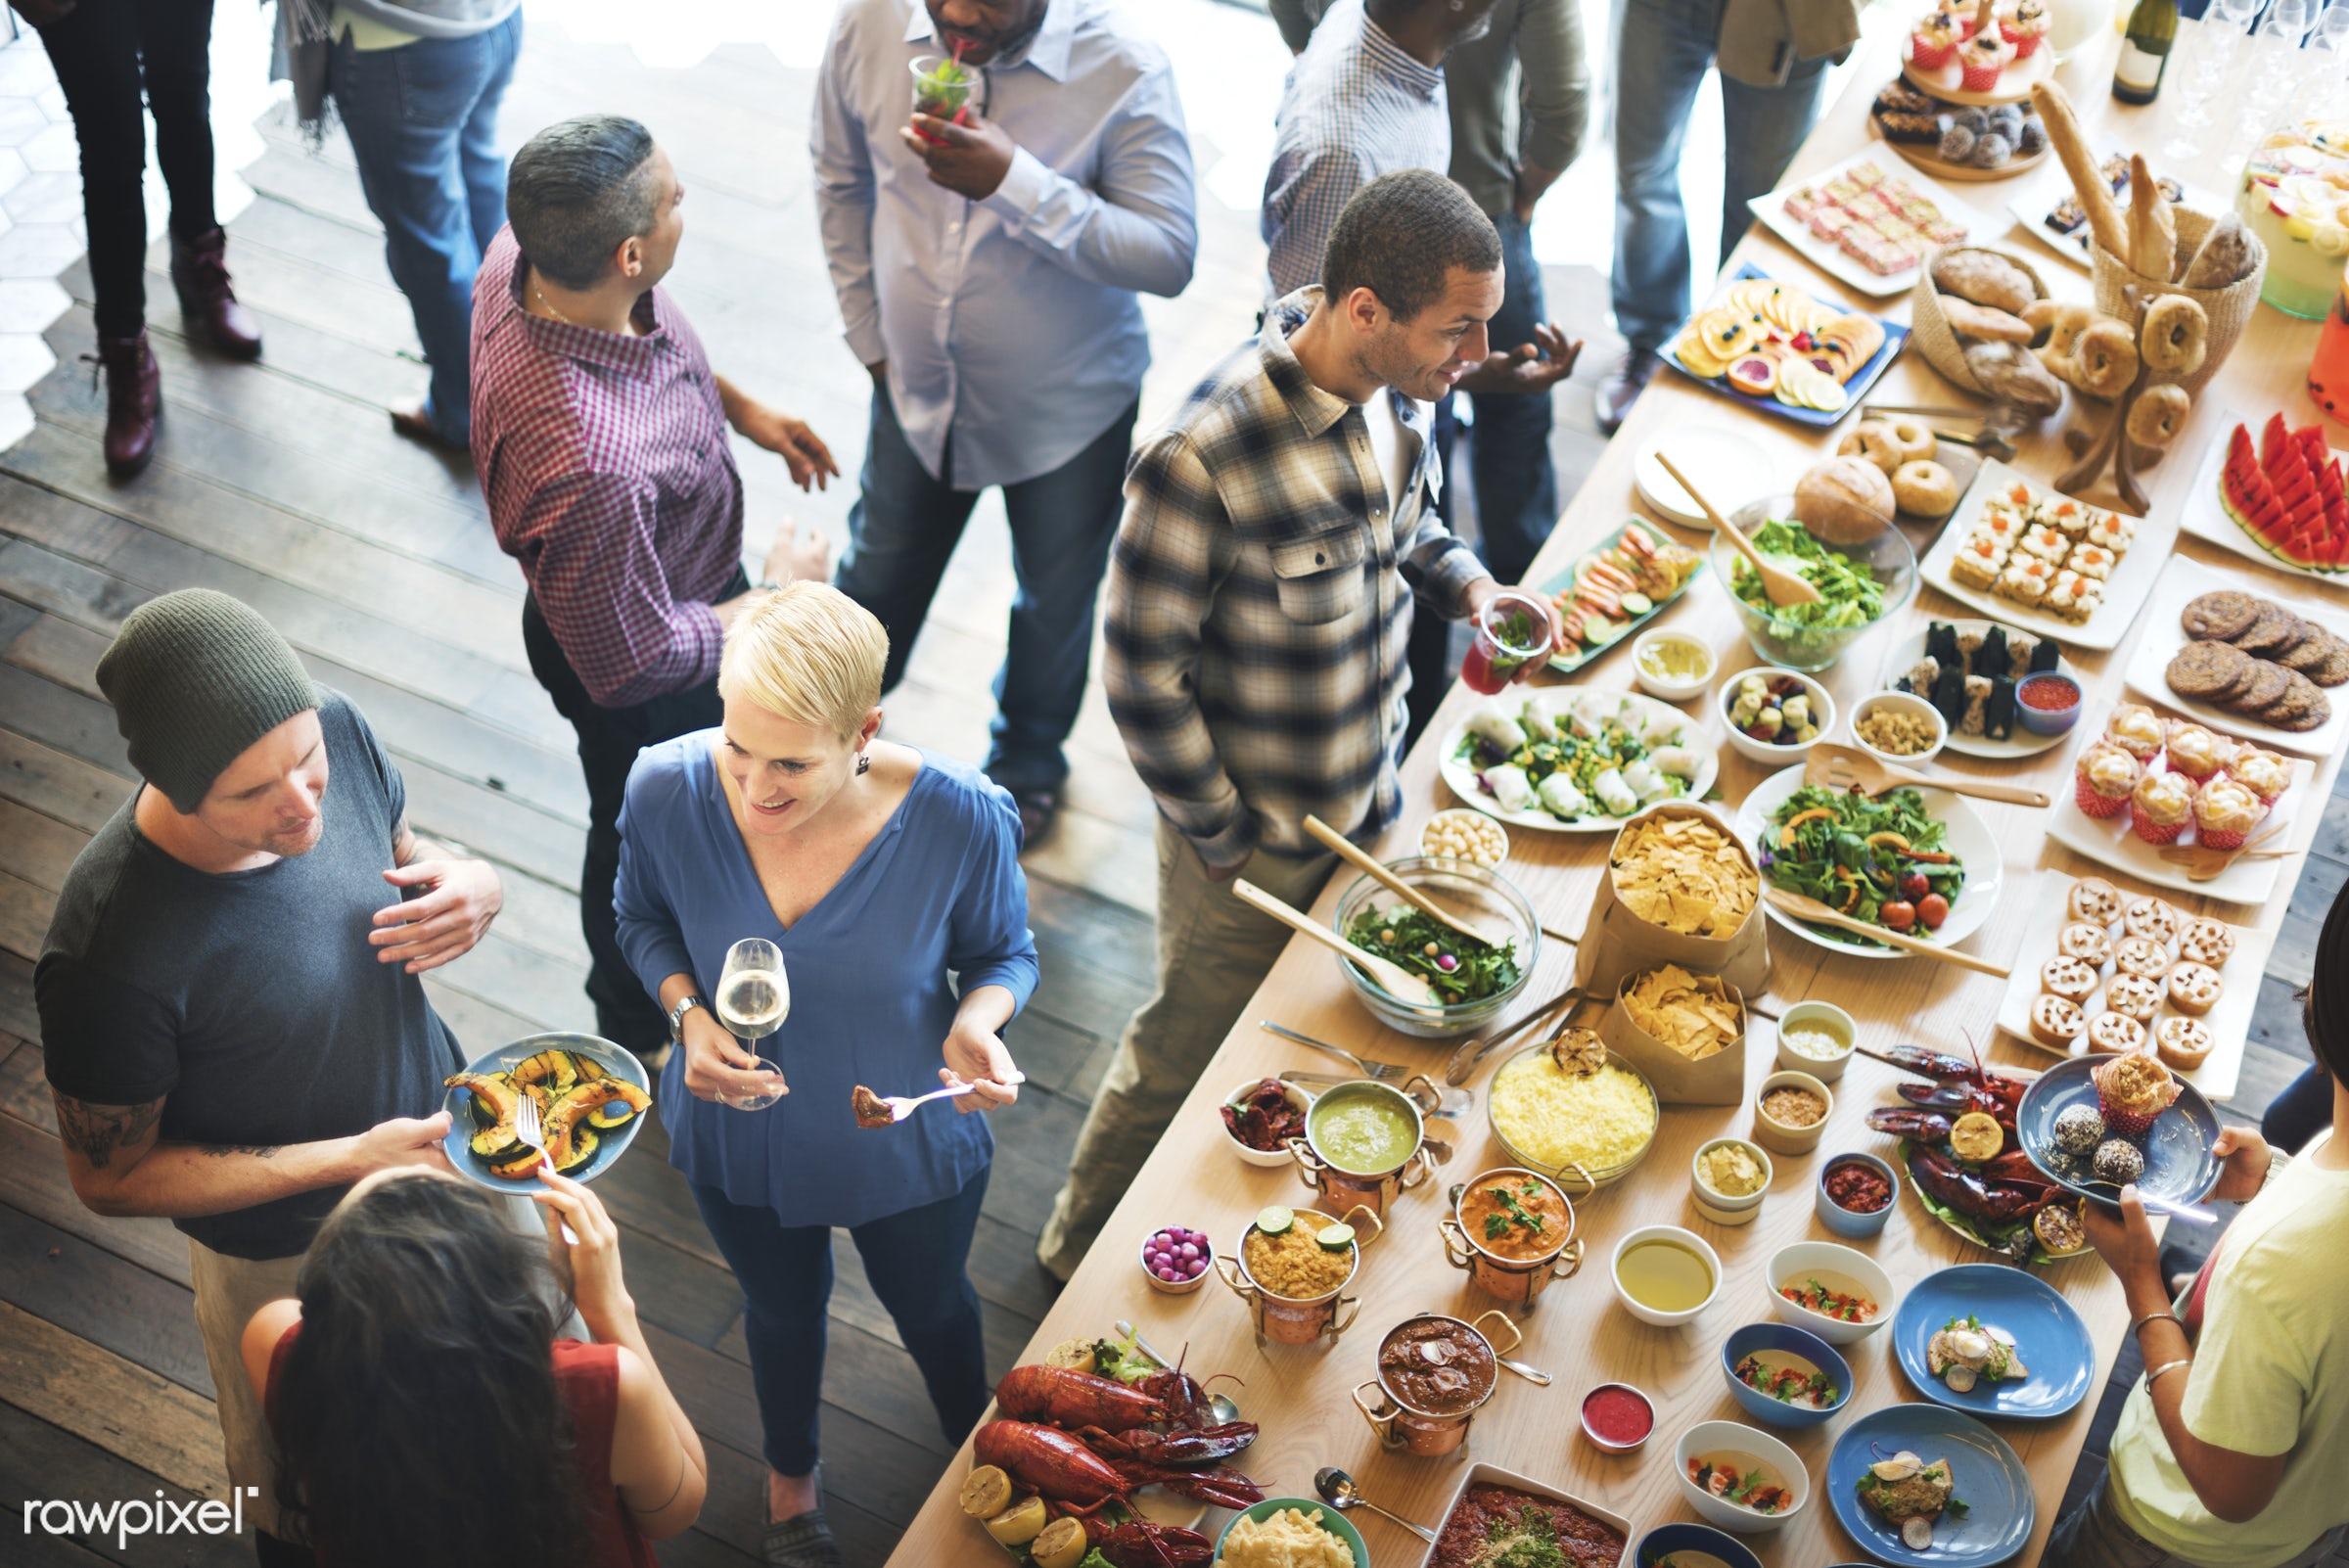 asian food, brunch, buffet, cafe, celebration, choice, crowd, dessert, diet, dining, dinner, diversity, drinking, eat,...